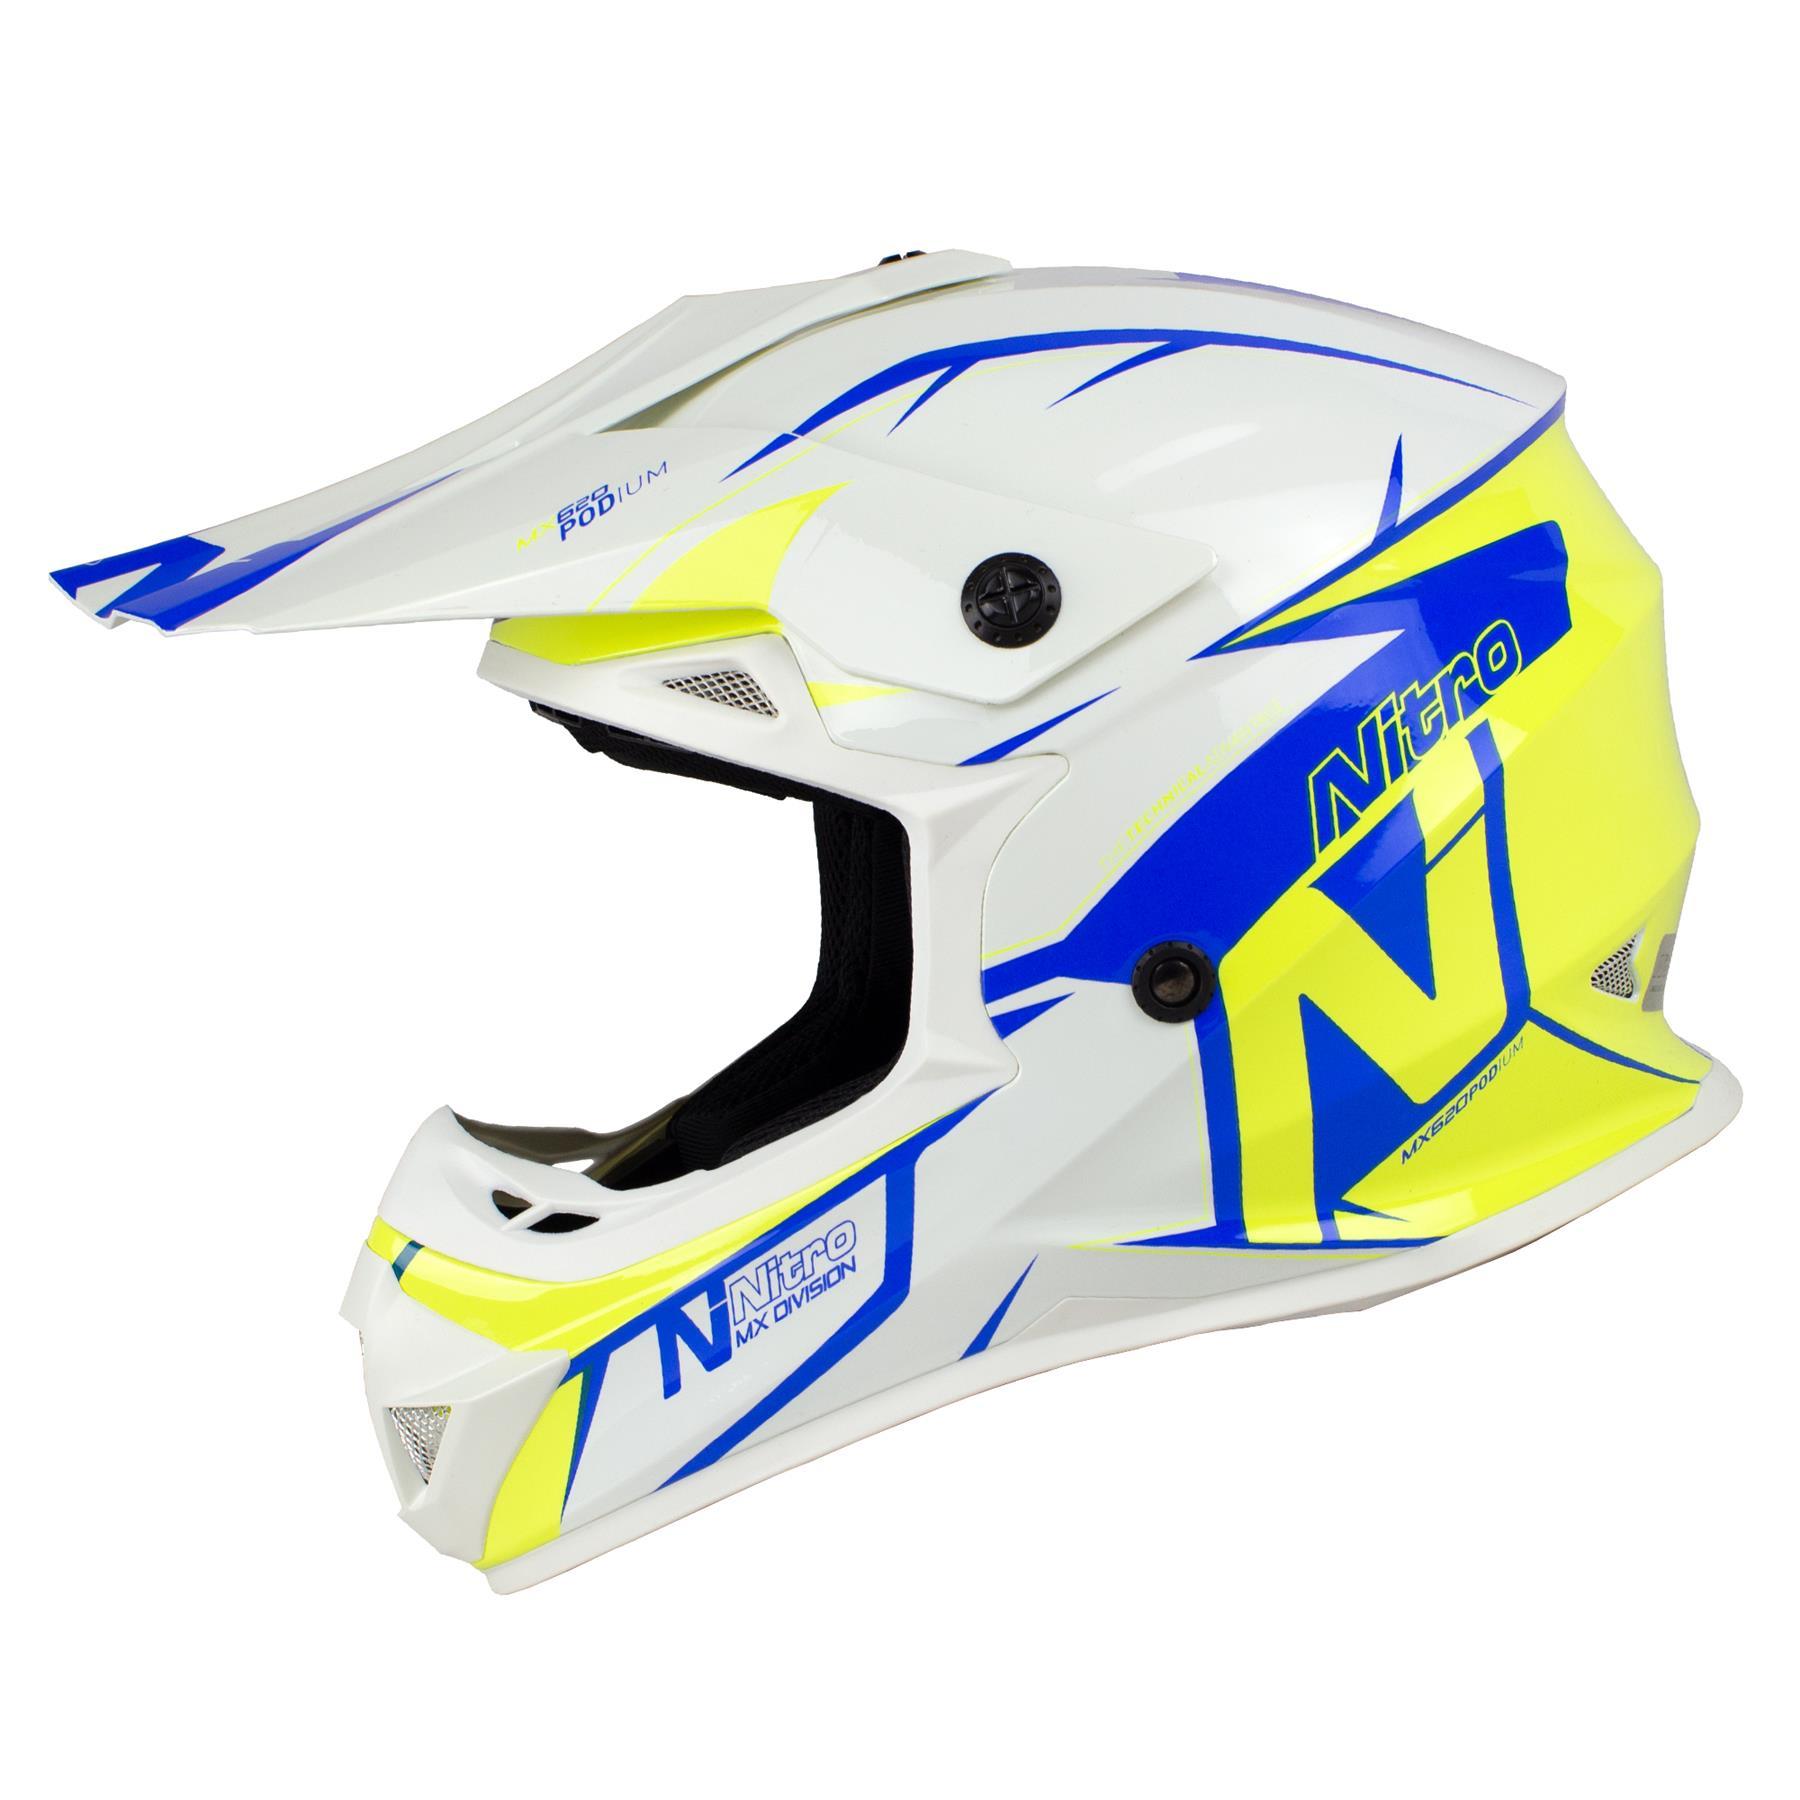 Nitro-MX620-Podium-MX-Motorcross-Motorcycle-Helmet-ATV-Enduro-ACU-Adult-Youth thumbnail 37